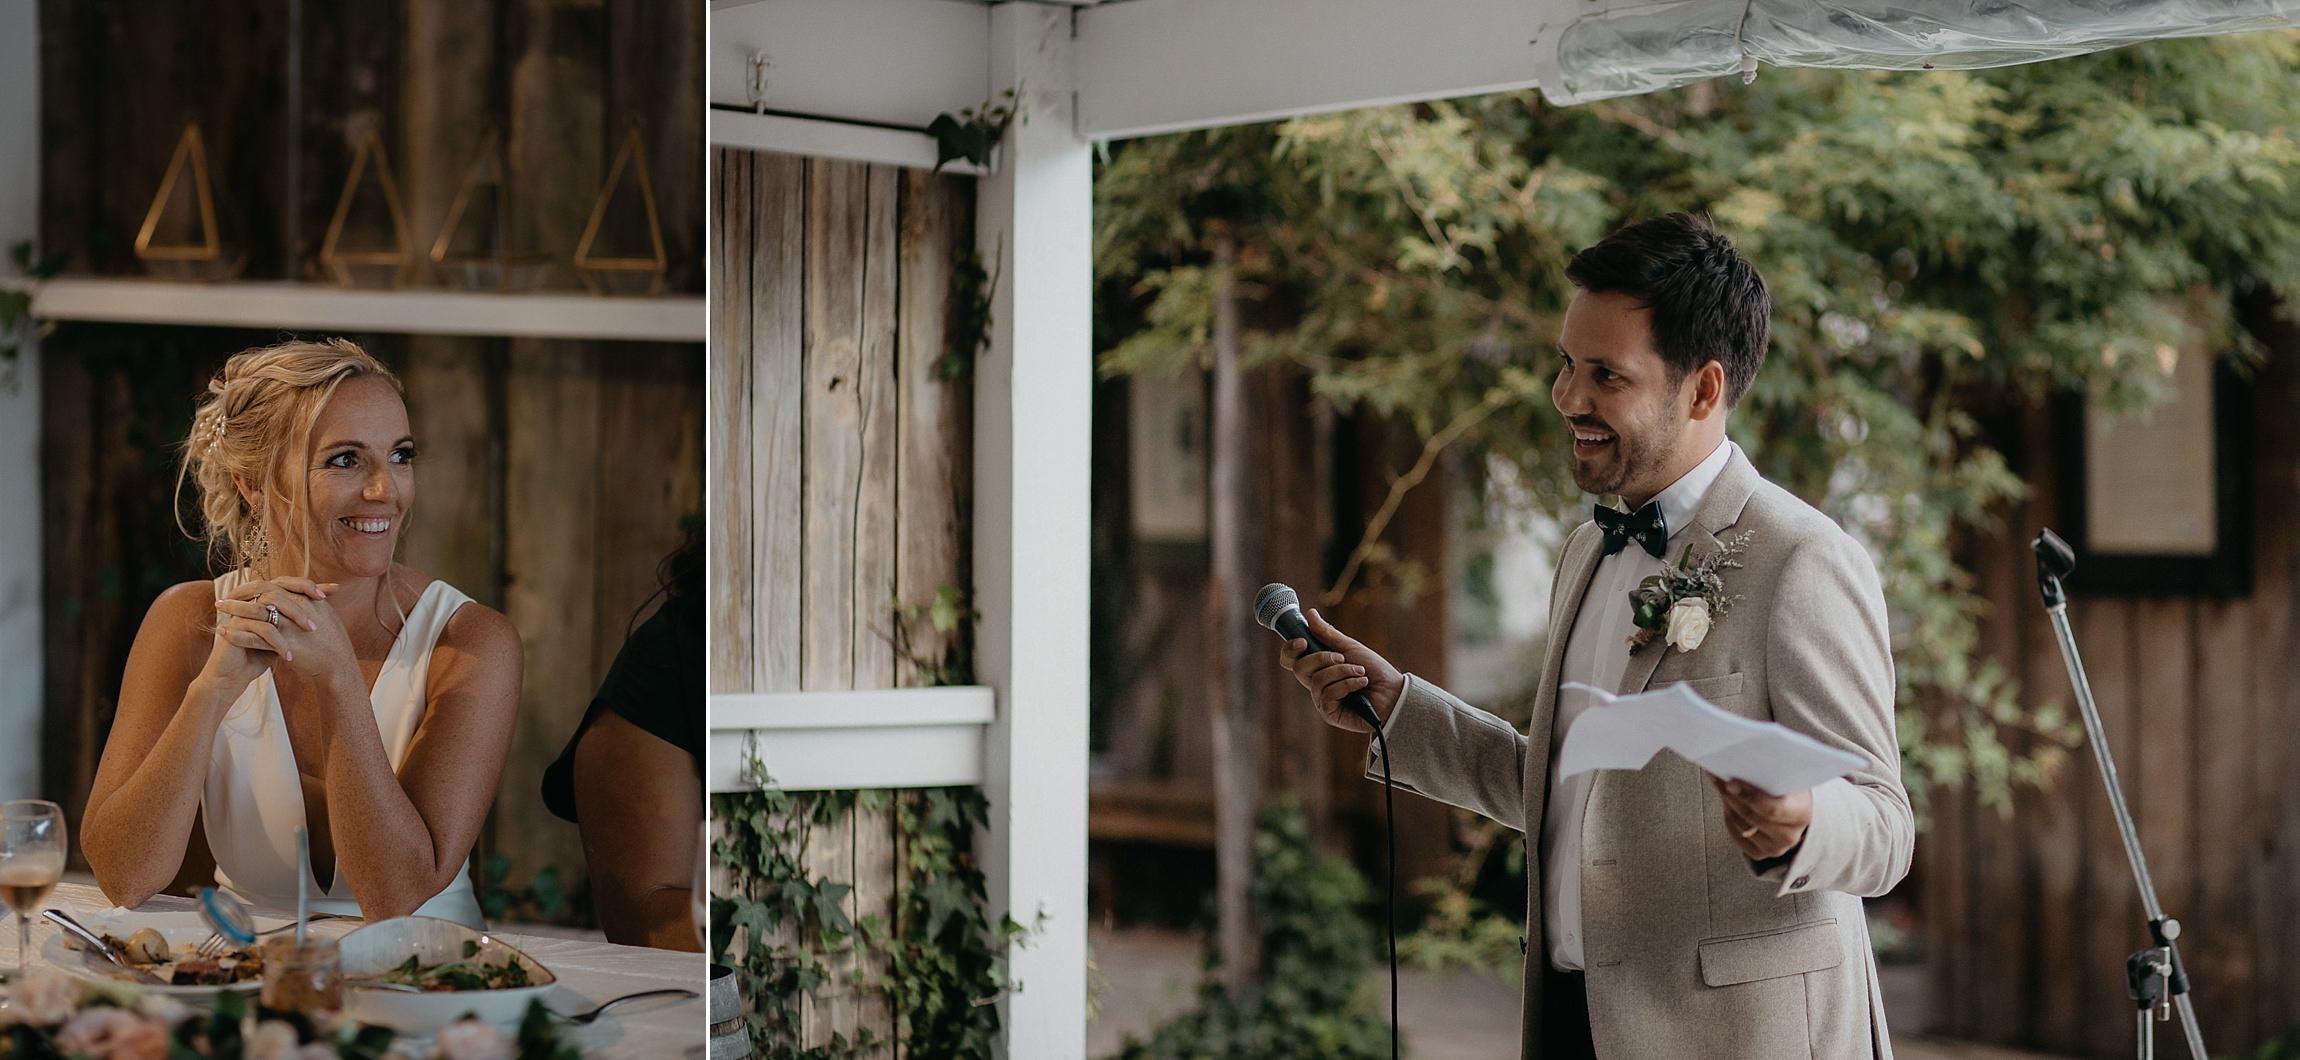 oldforestschool-wedding-blog-181.jpg